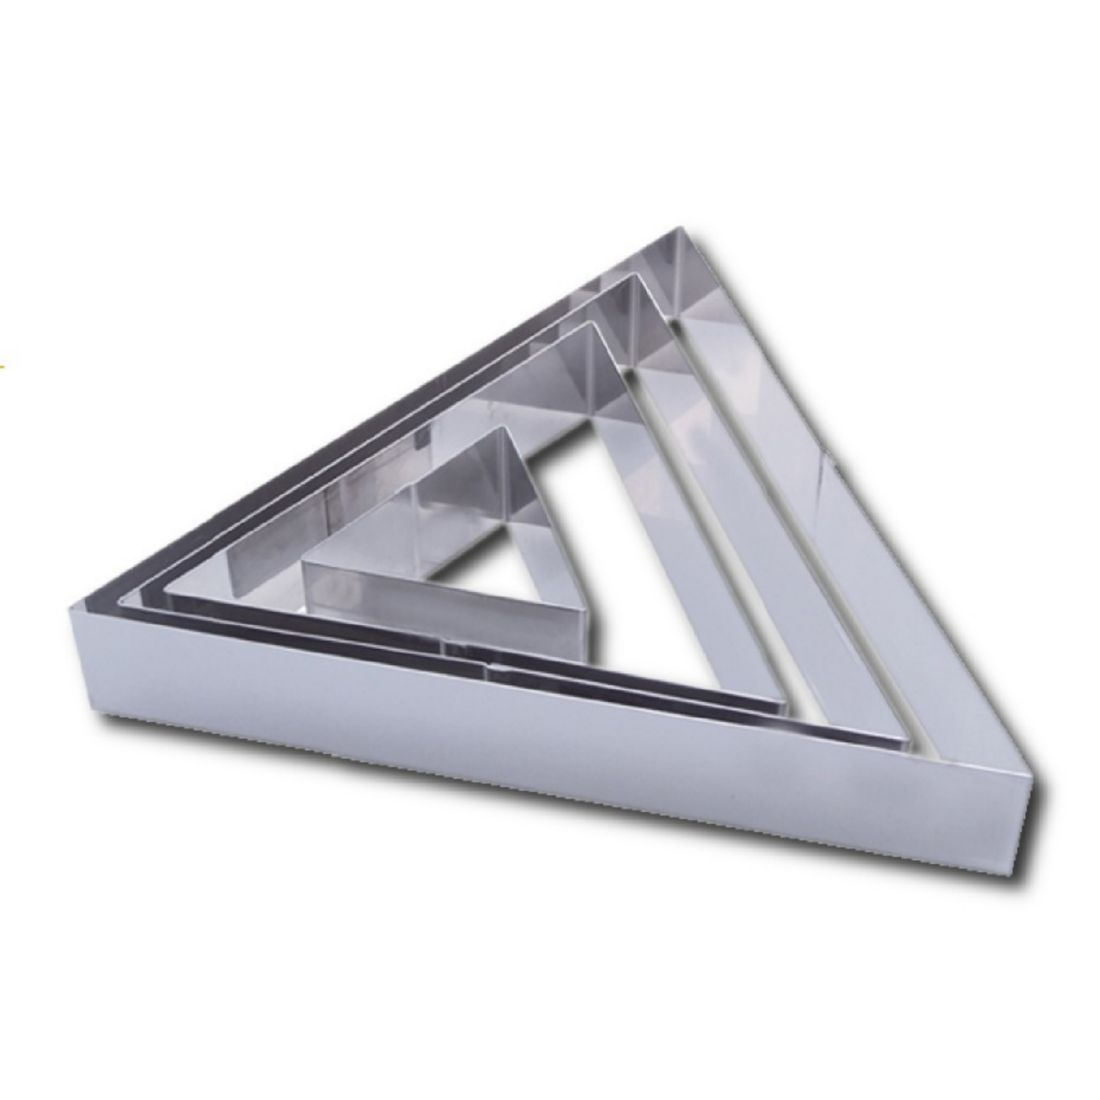 Forma trojúhelníková 94 x 45 mm